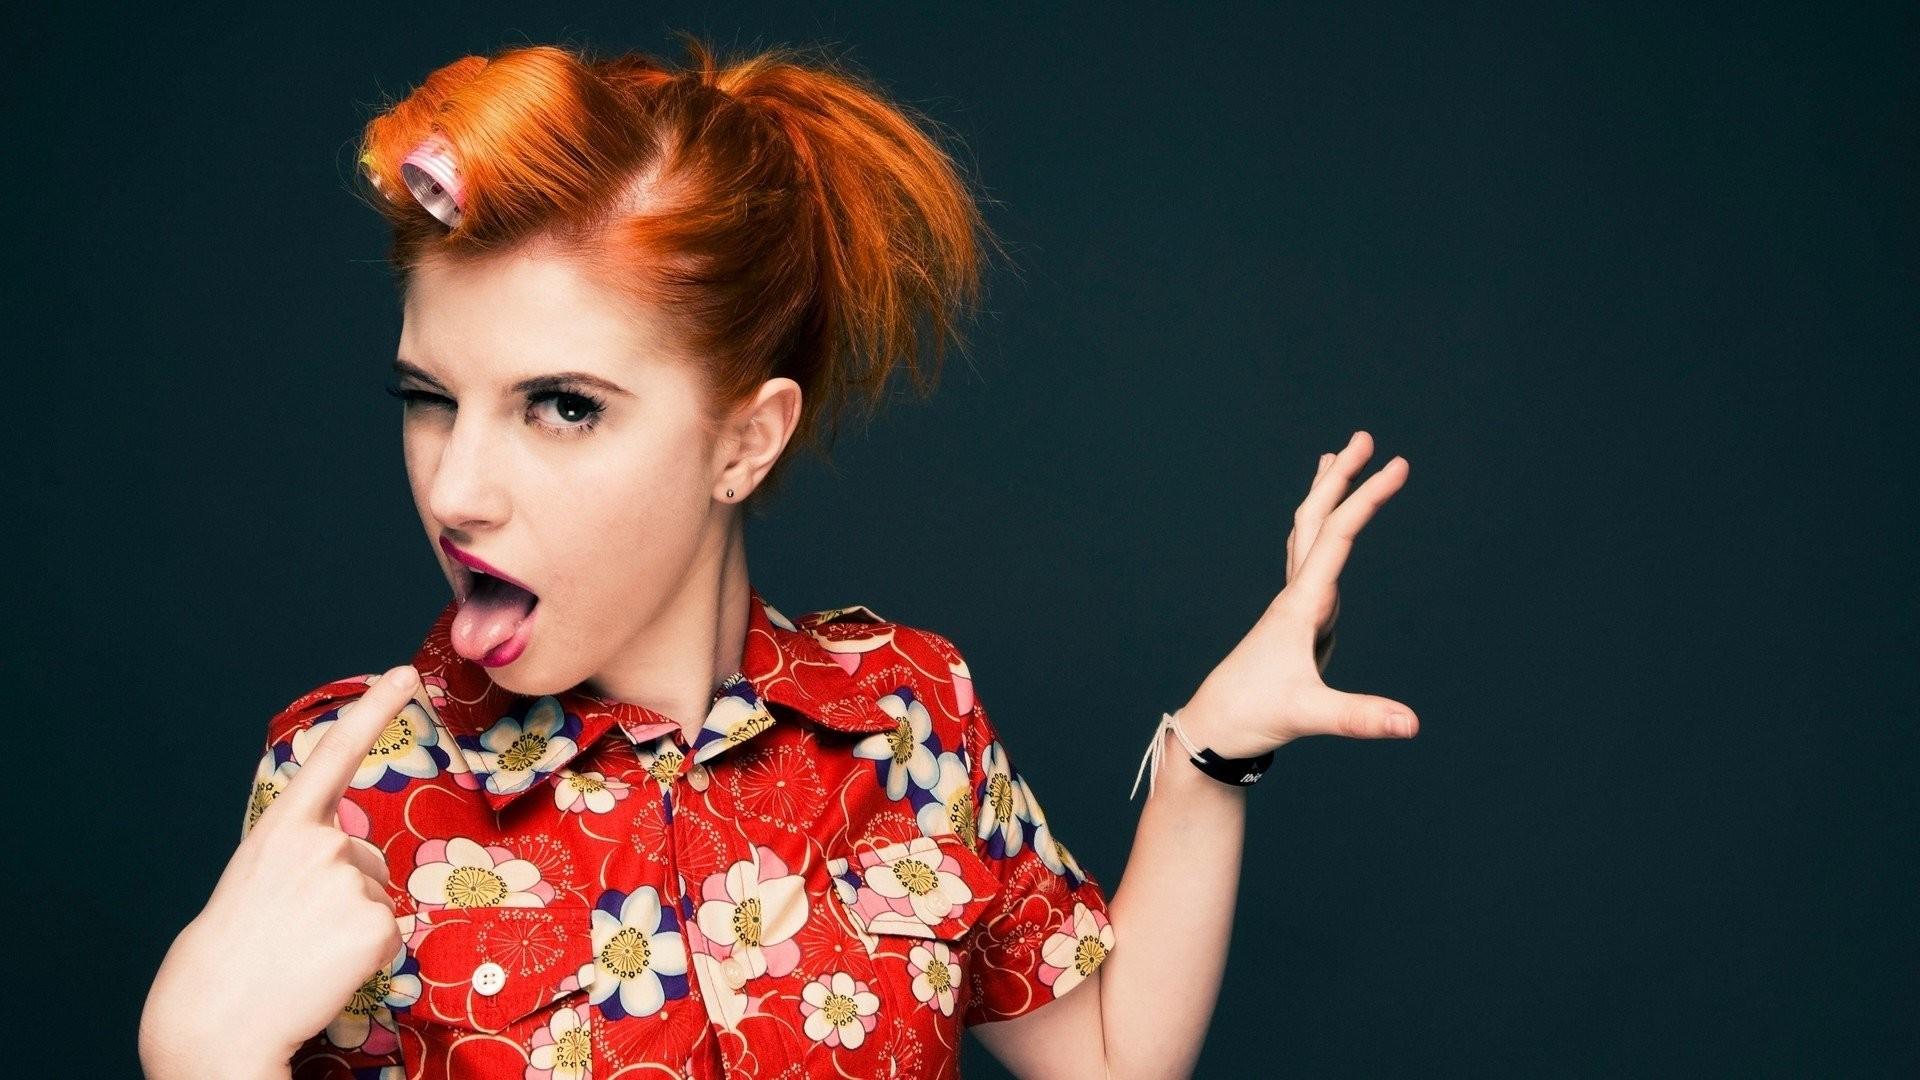 hayley williams paramore women music redheads pop emo singers alternative  punk rock